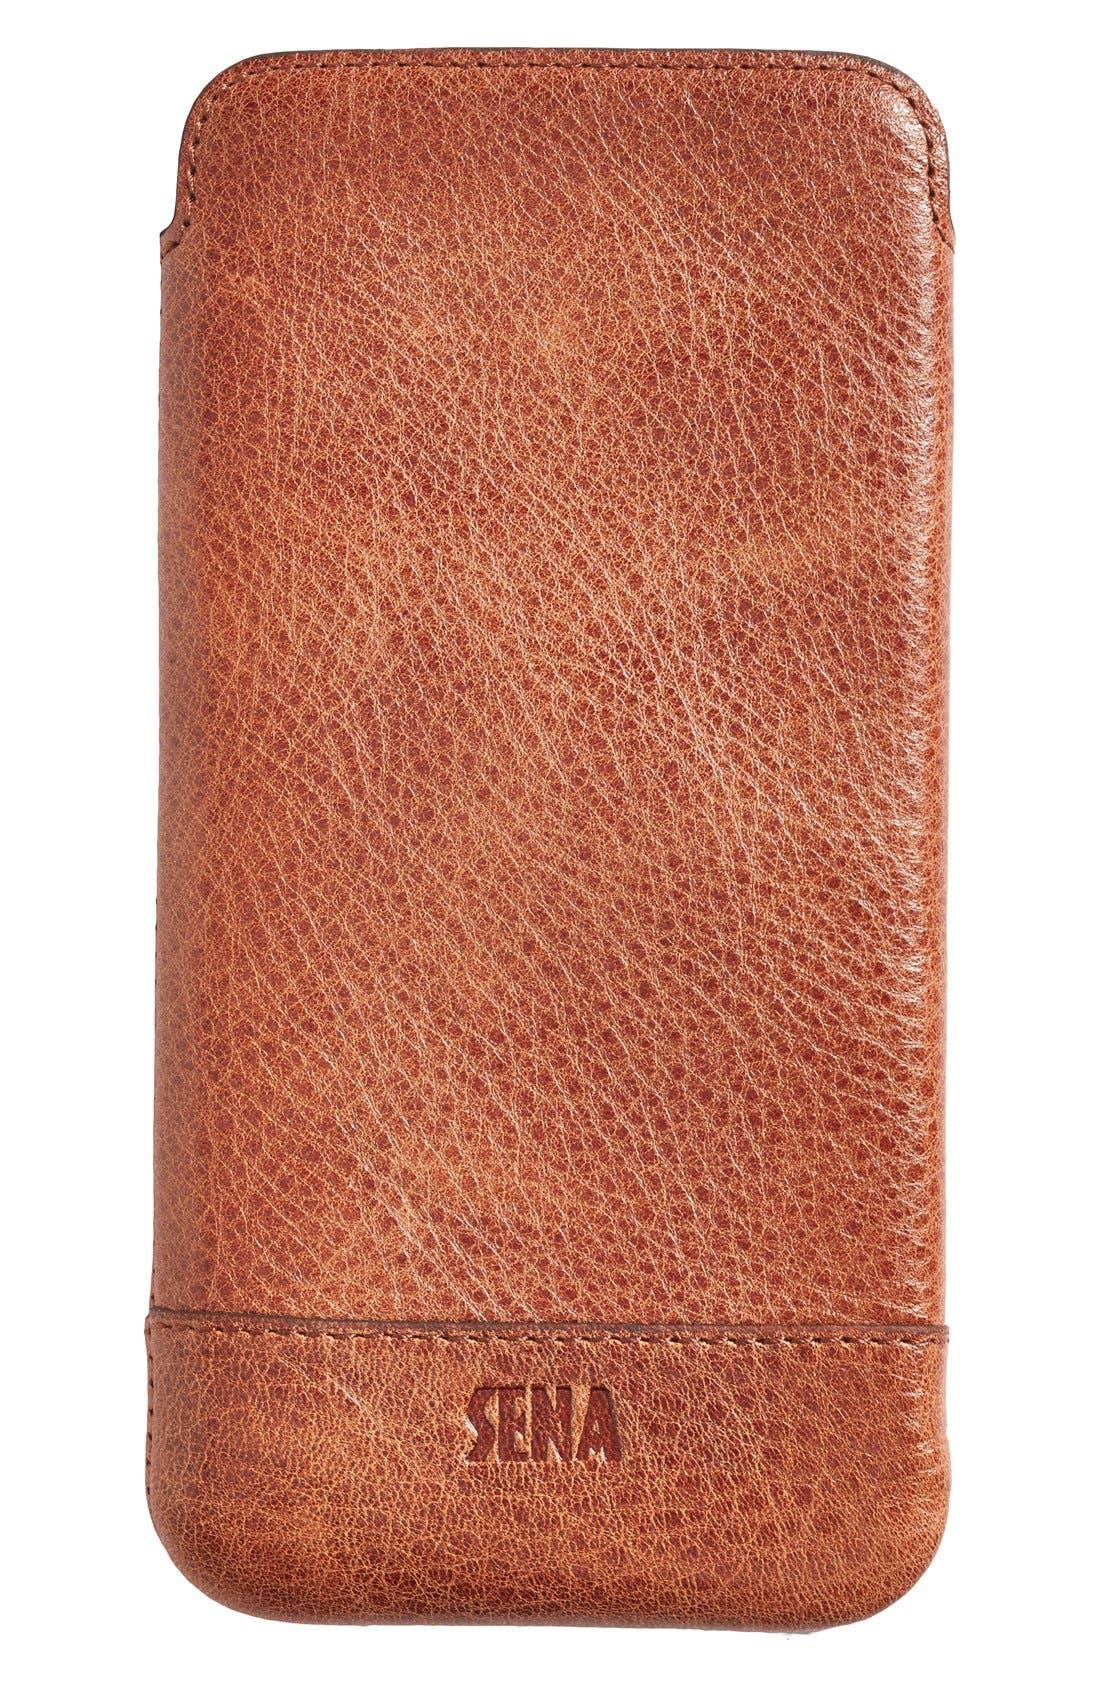 Main Image - Sena Heritage - Ultra Slim Leather iPhone 6 Plus/6s Plus Pouch